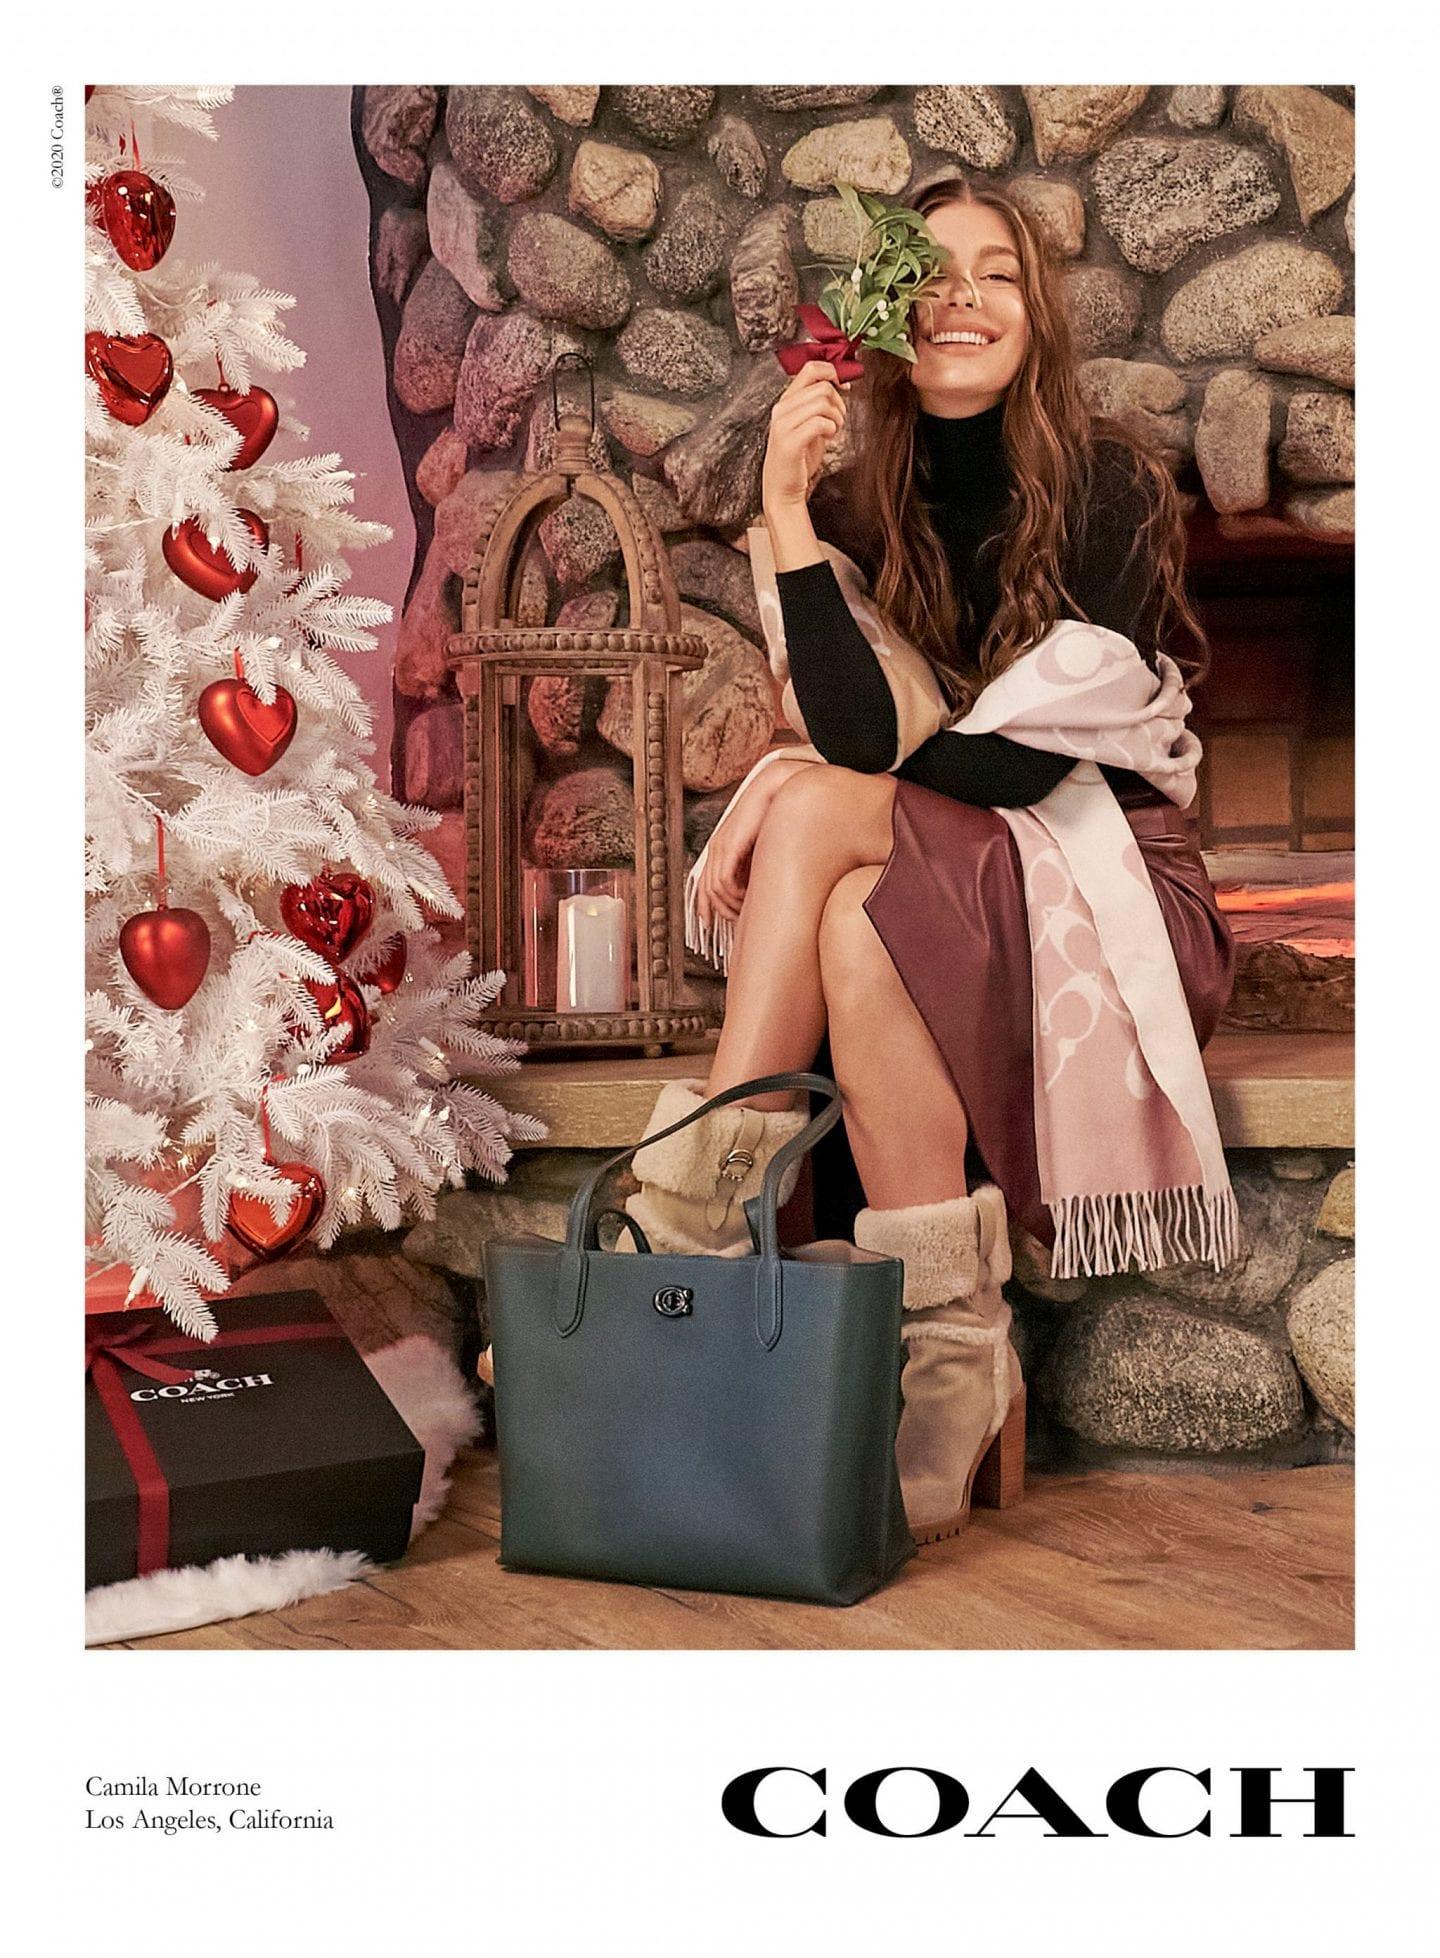 Camila Morrone coach new york christmas campaign 2020